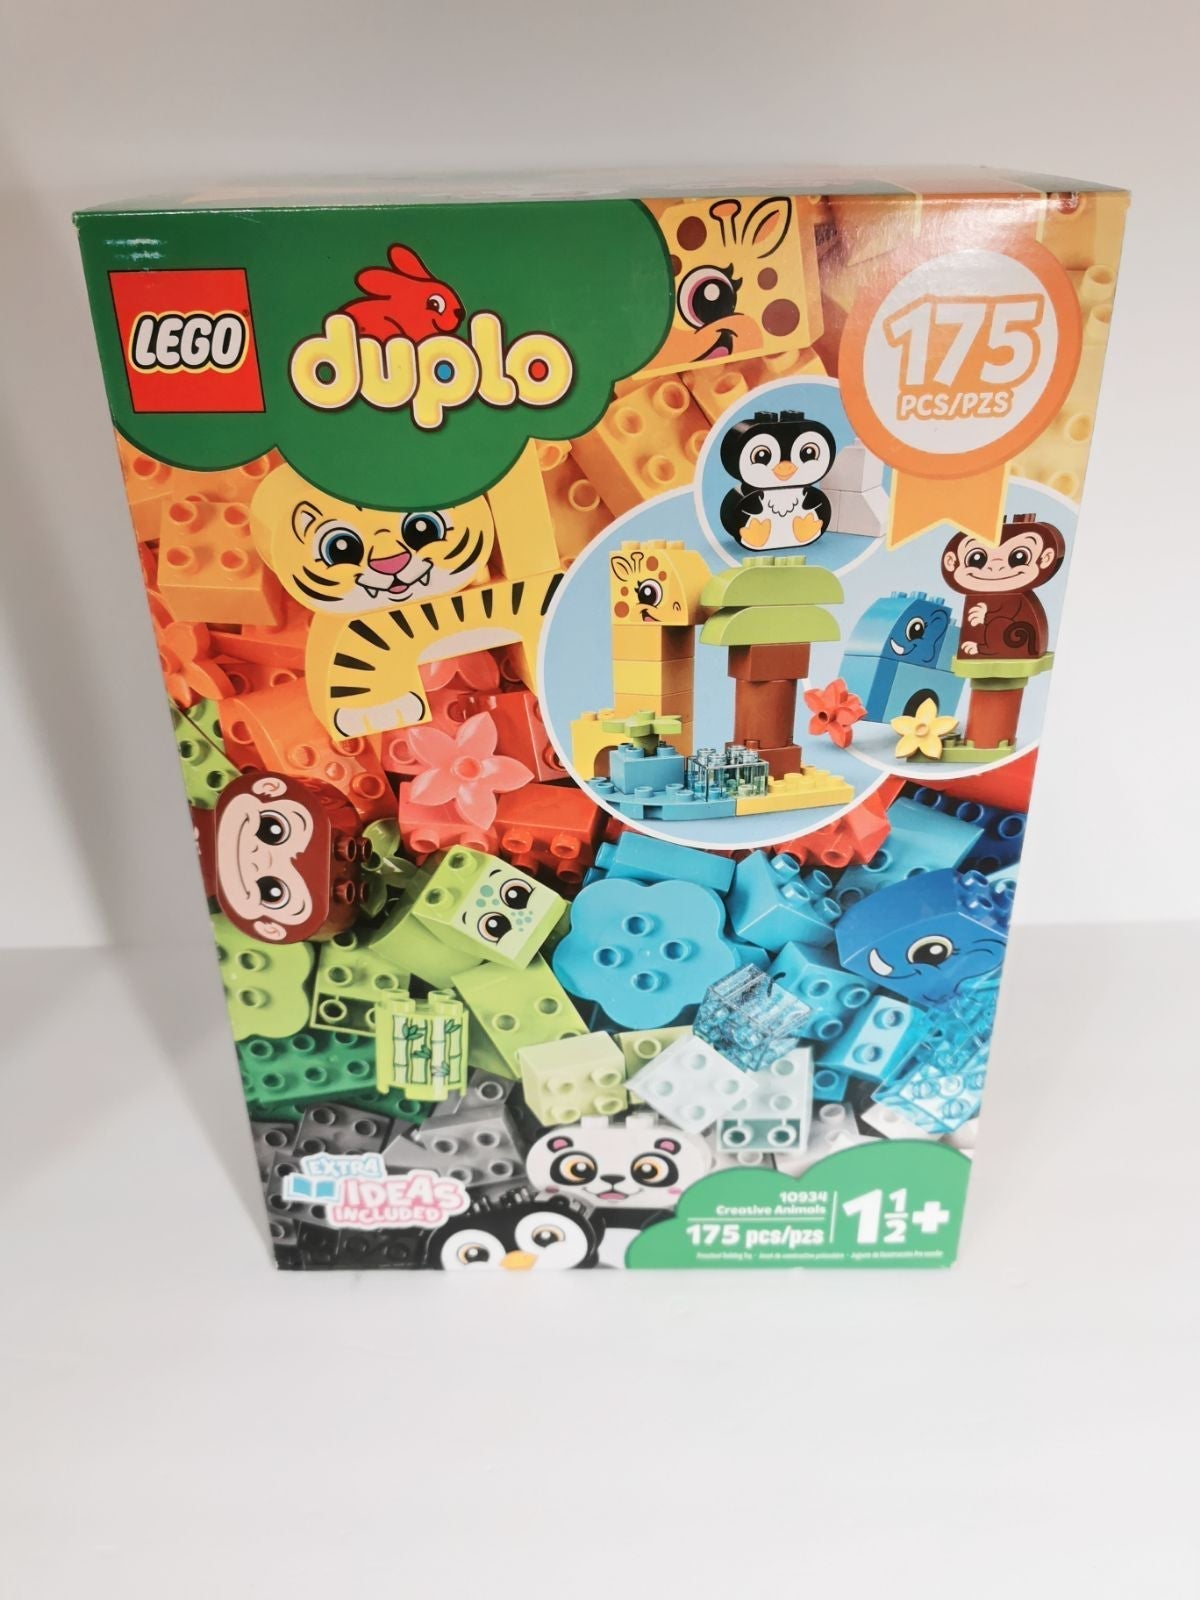 Toy blocks 175pcs creative animals devel